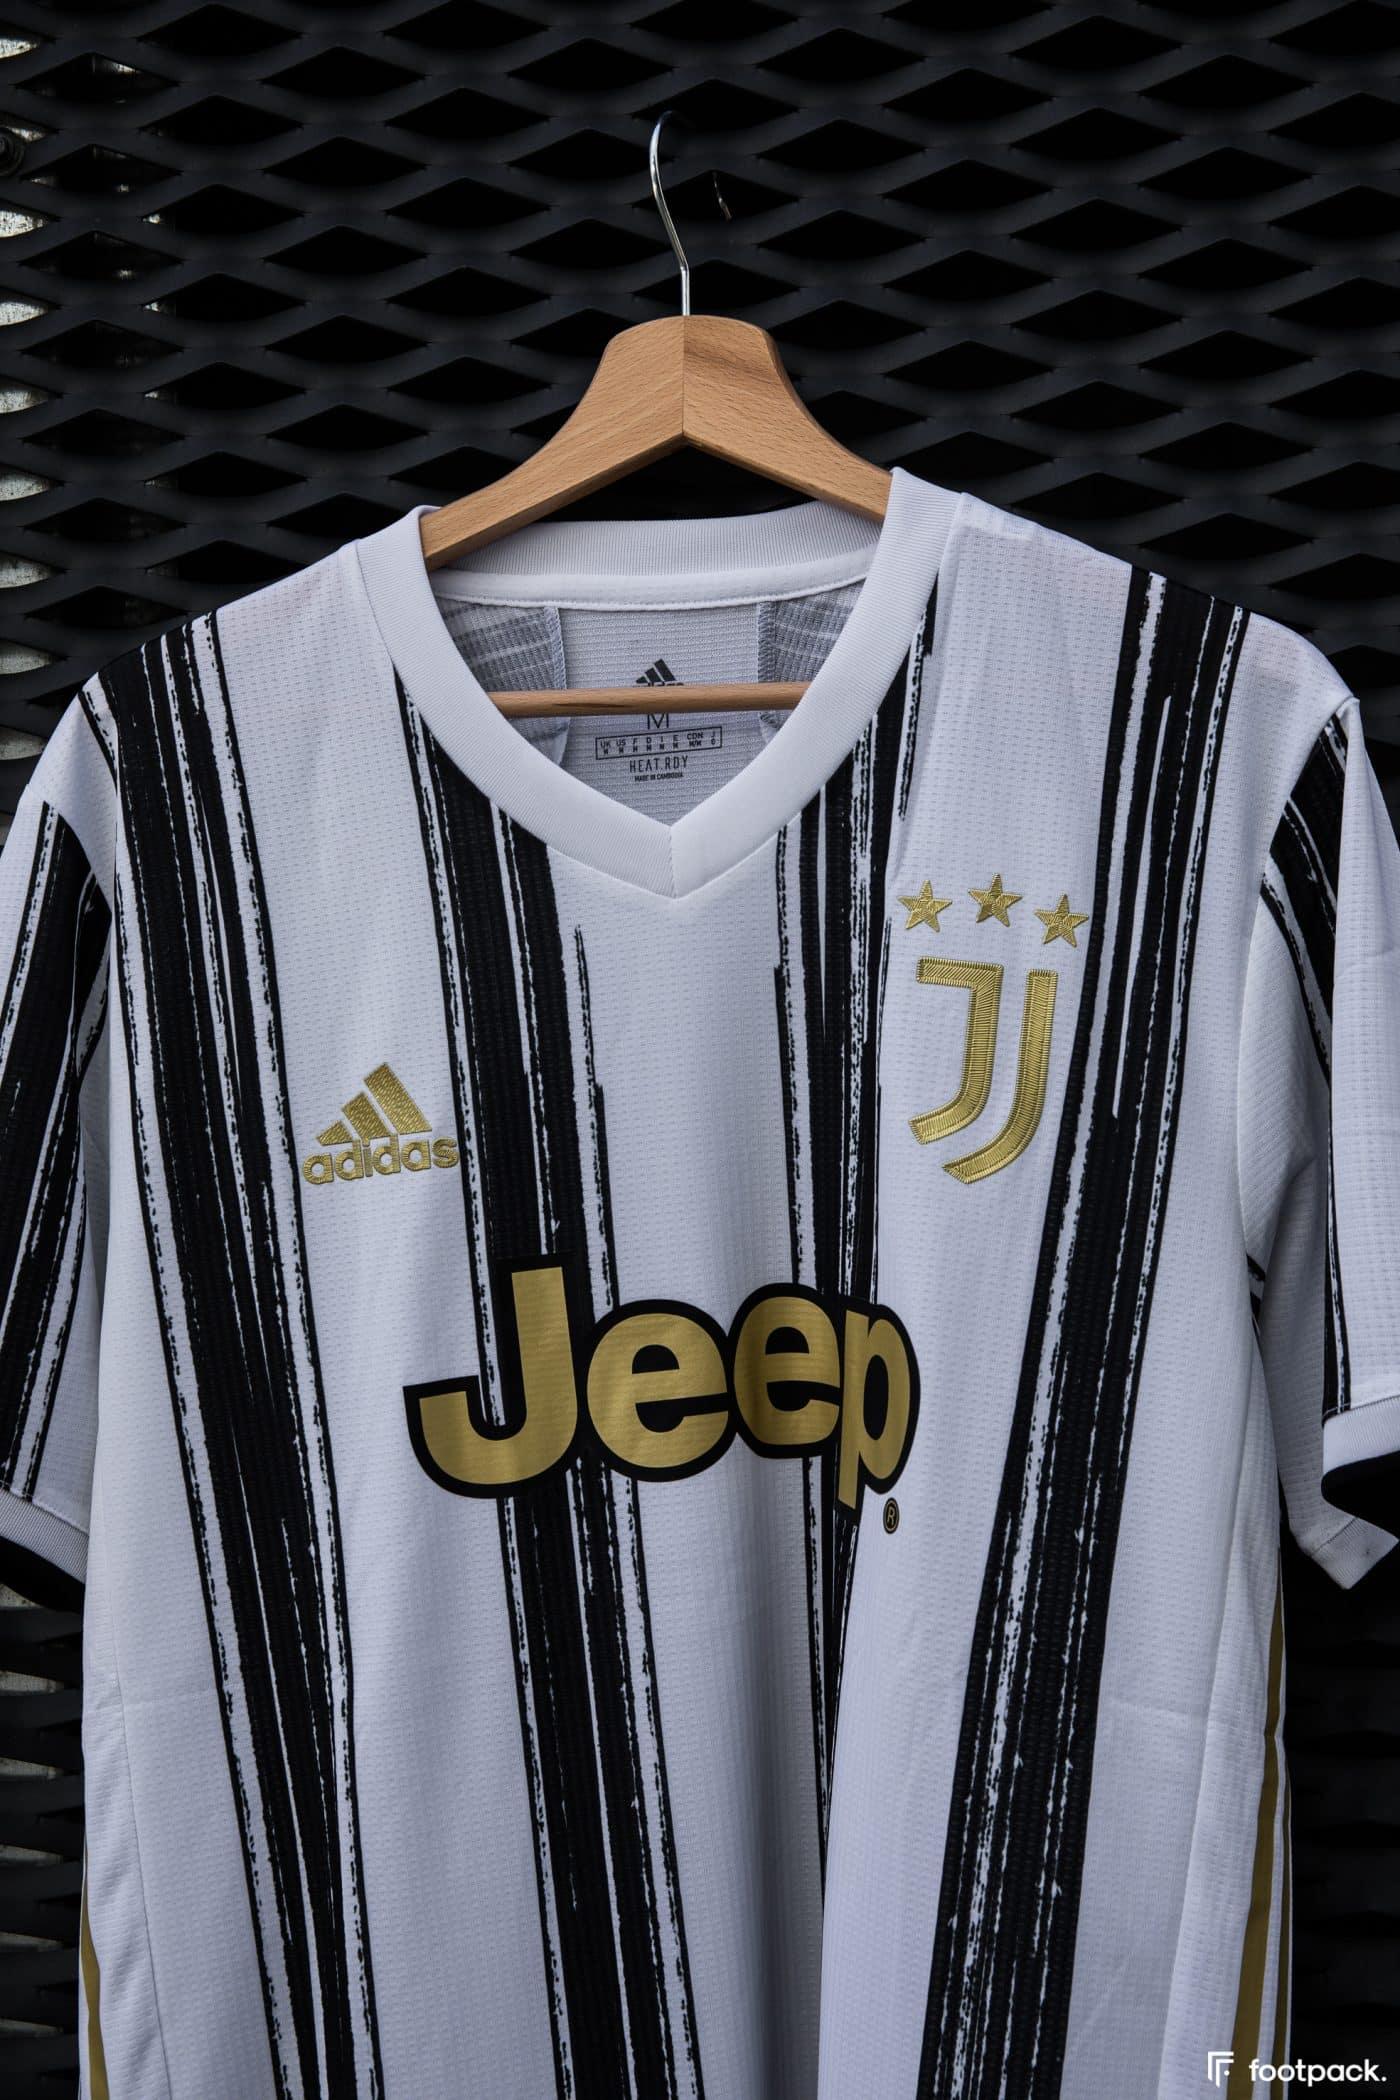 maillot-domicile-juventus-2020-2021-adidas-footpack-20